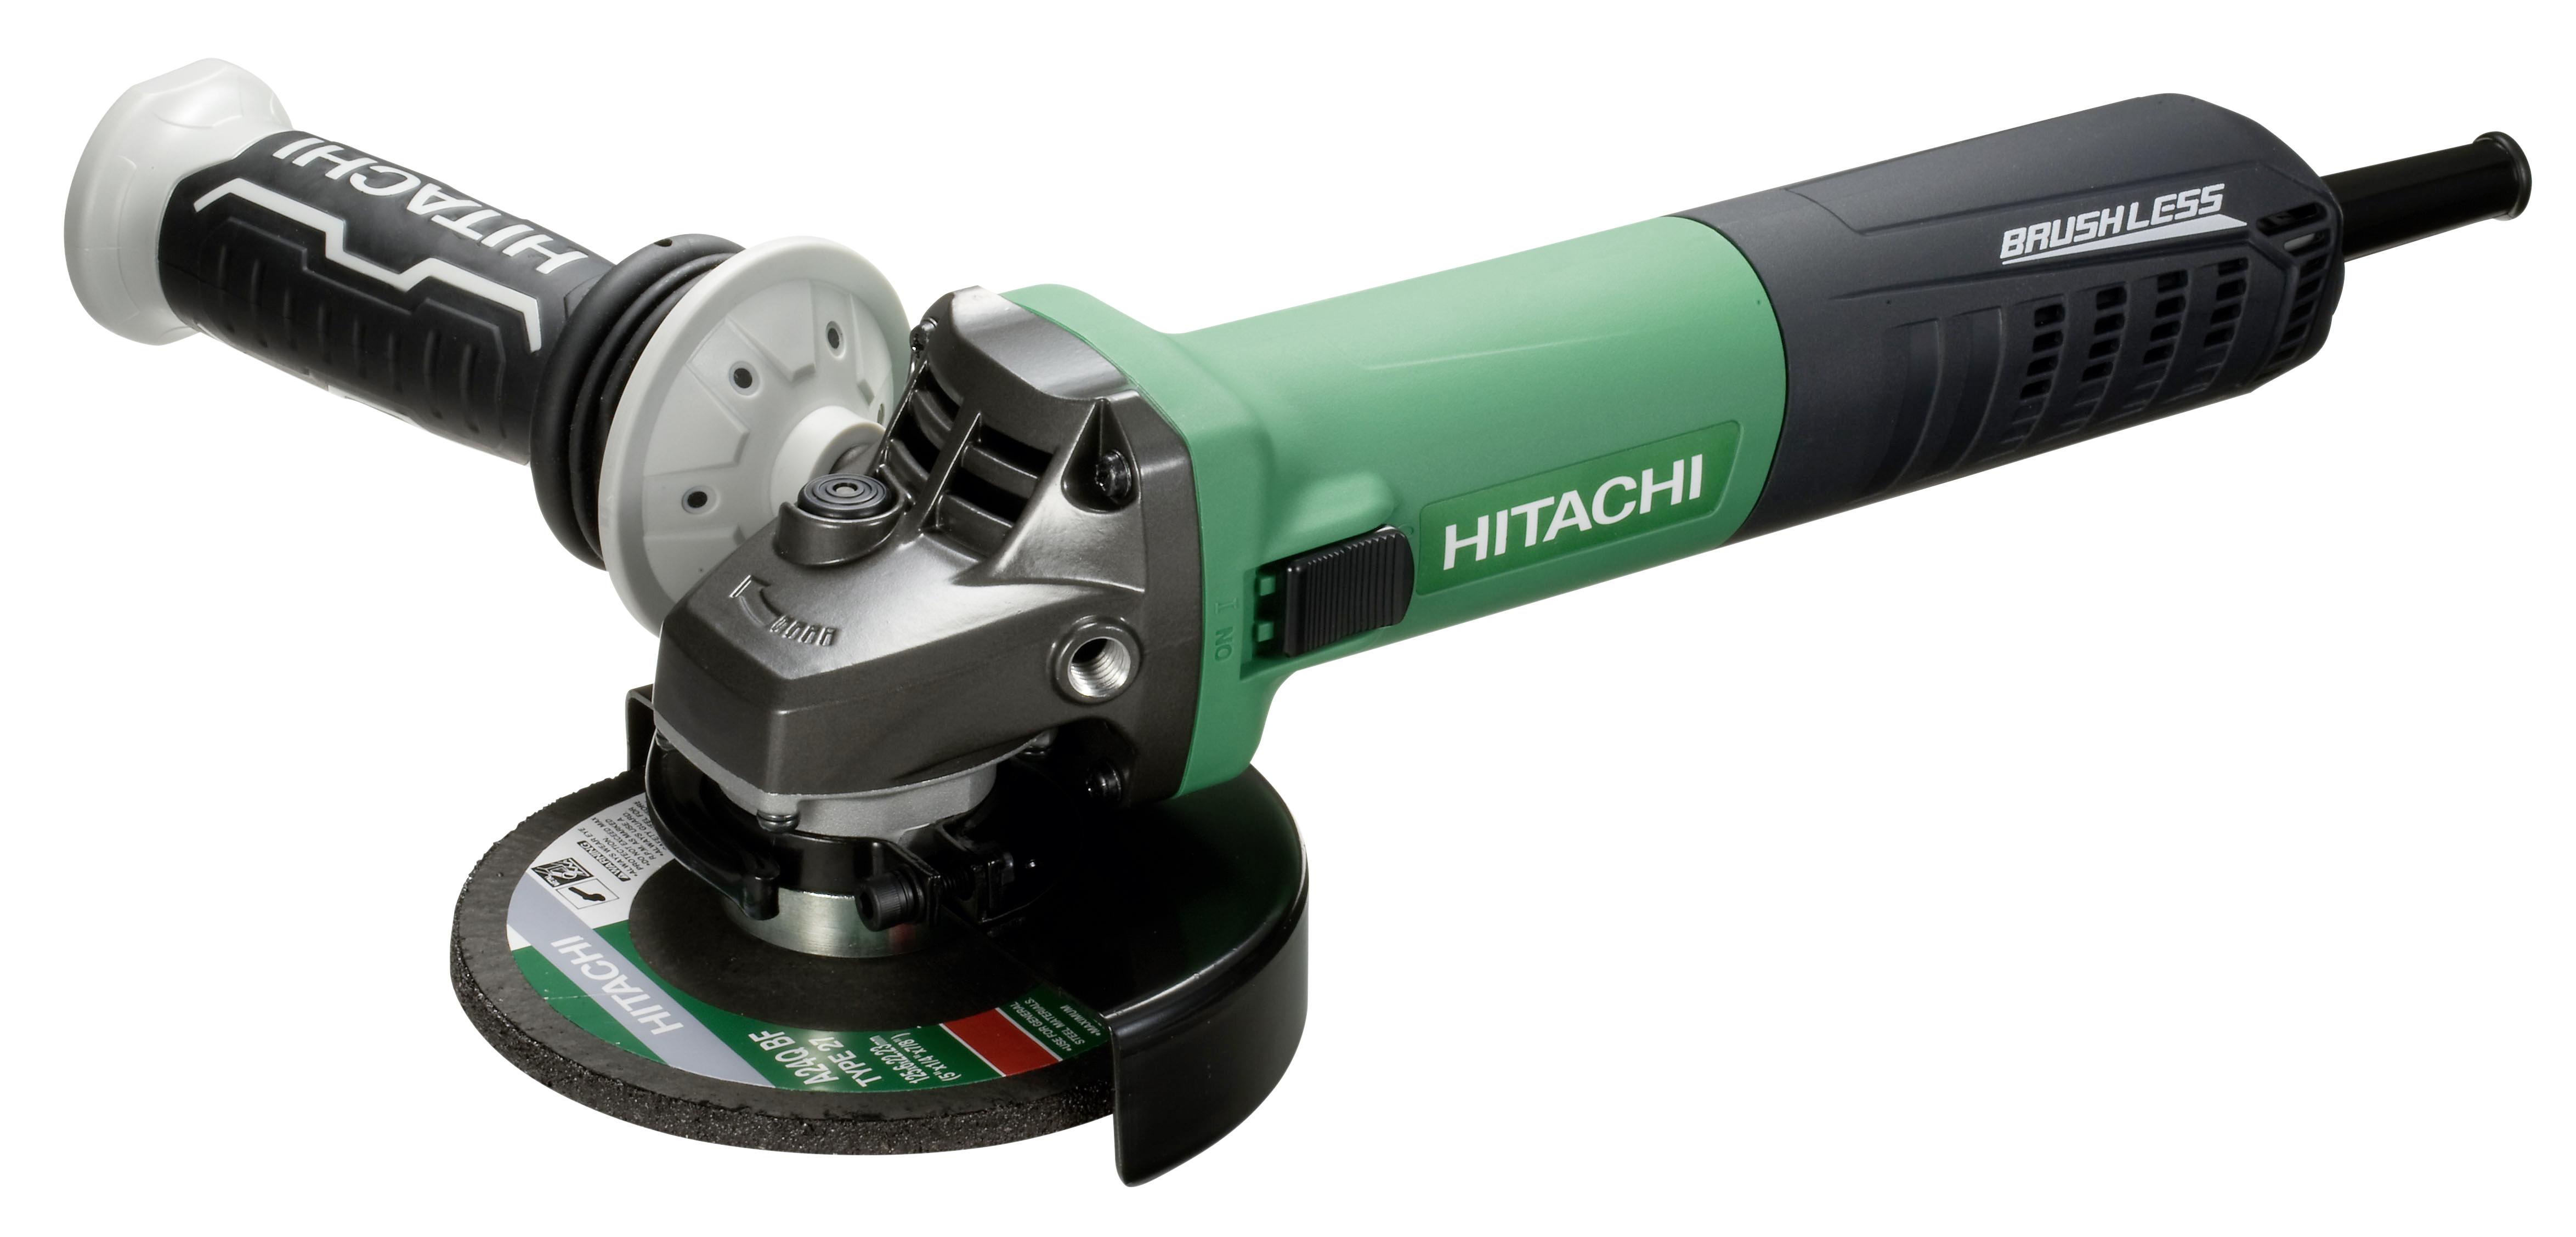 G13VE-Brushless-mini-moulder-125-mm-1320-W